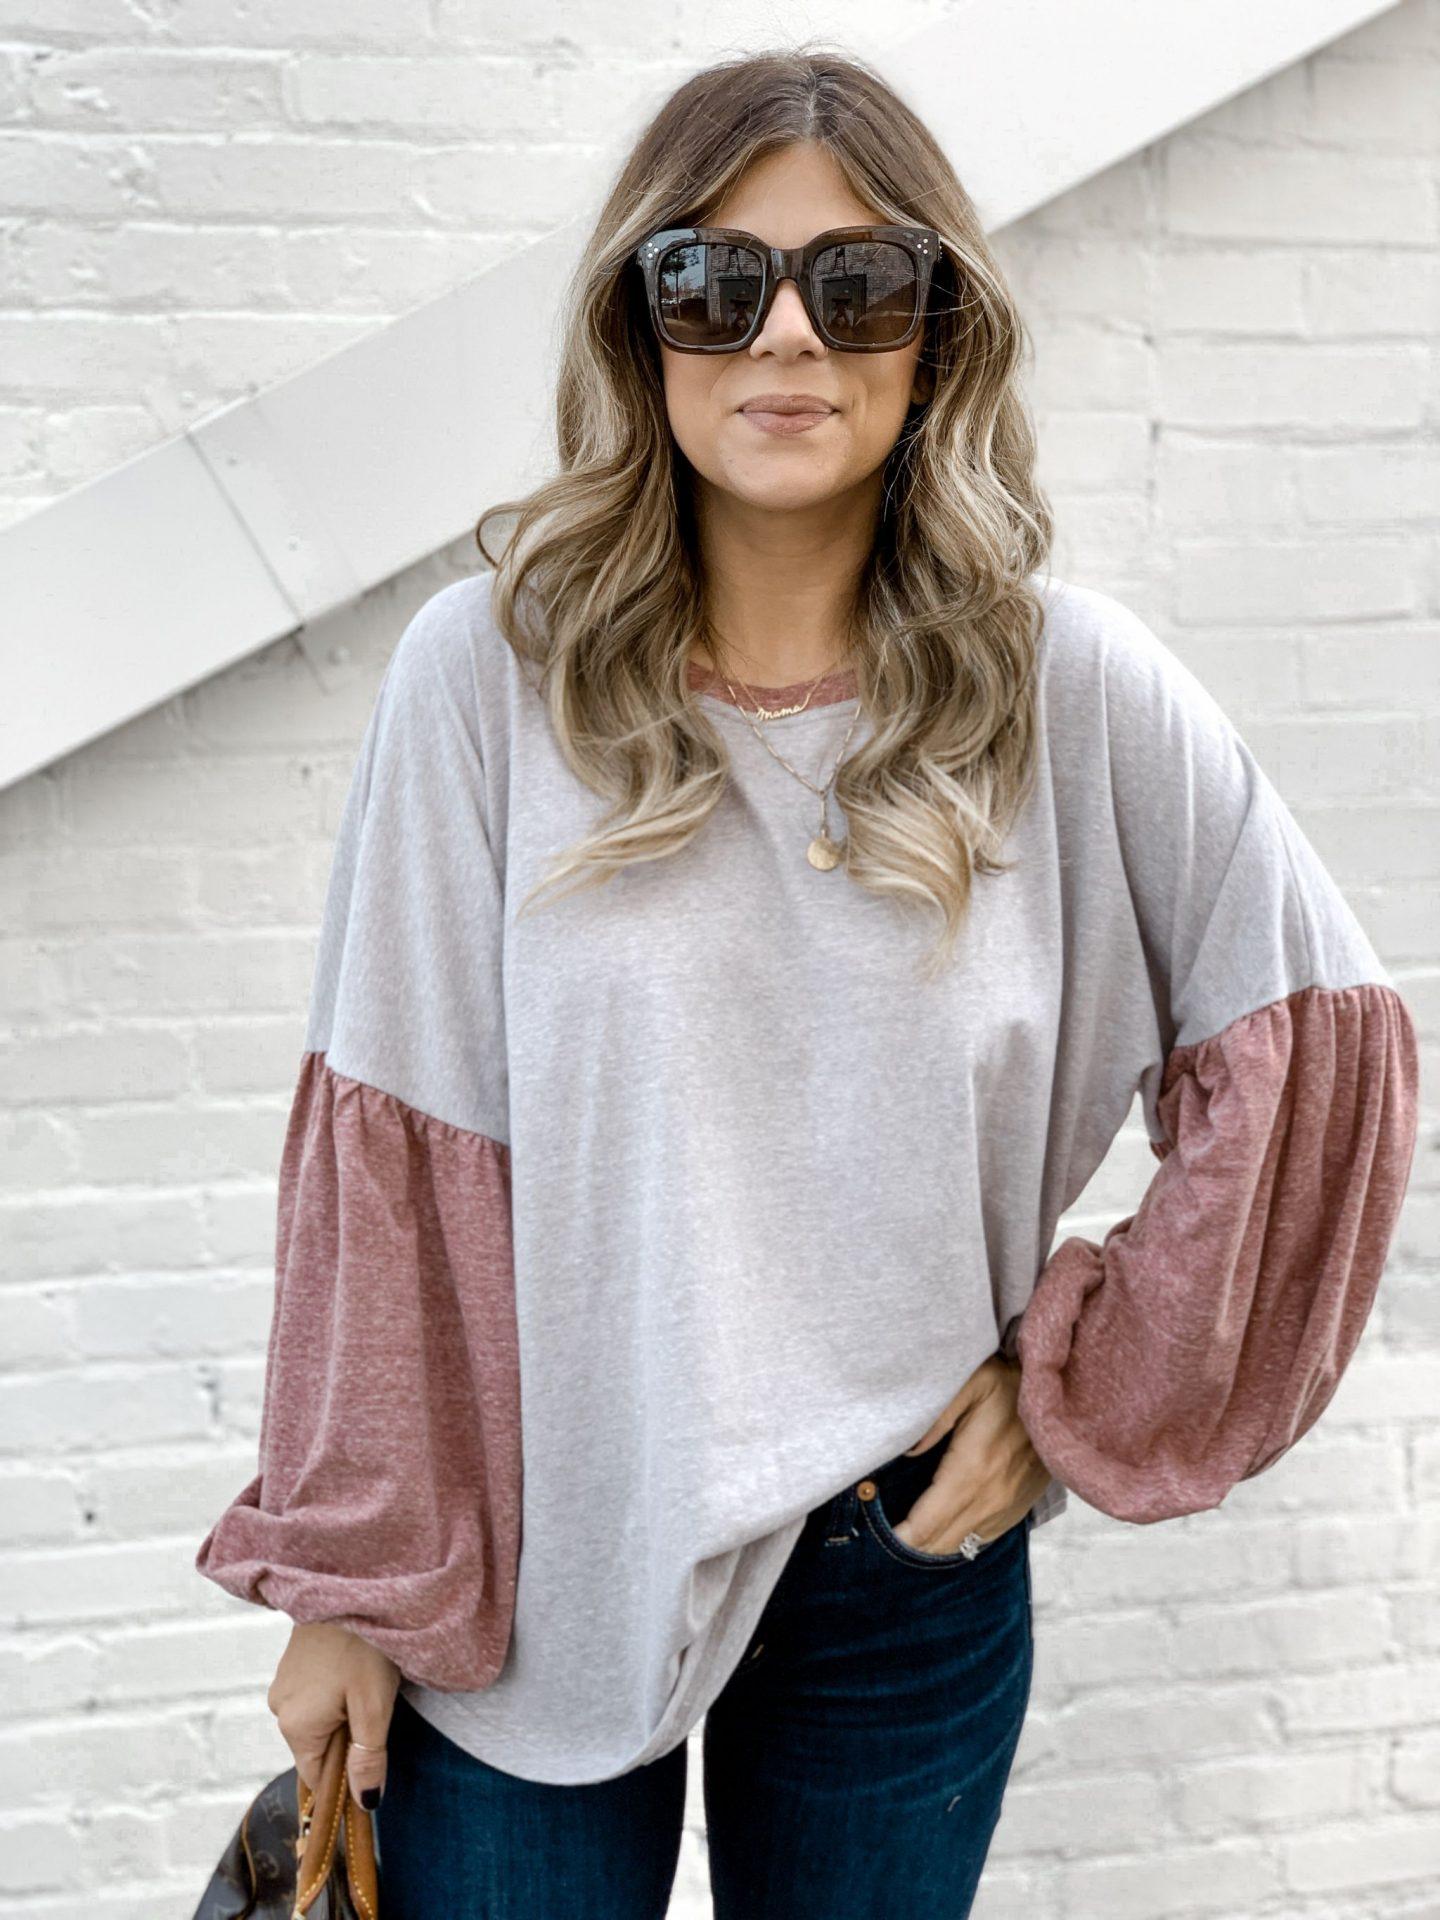 Celine Sunglasses, Celine Dupe, Sunnies, Oversized Sunglasses, Shoplindsey, Madewell Jeans, Stella & Dot, https://rstyle.me/n/cw4igmccvt7